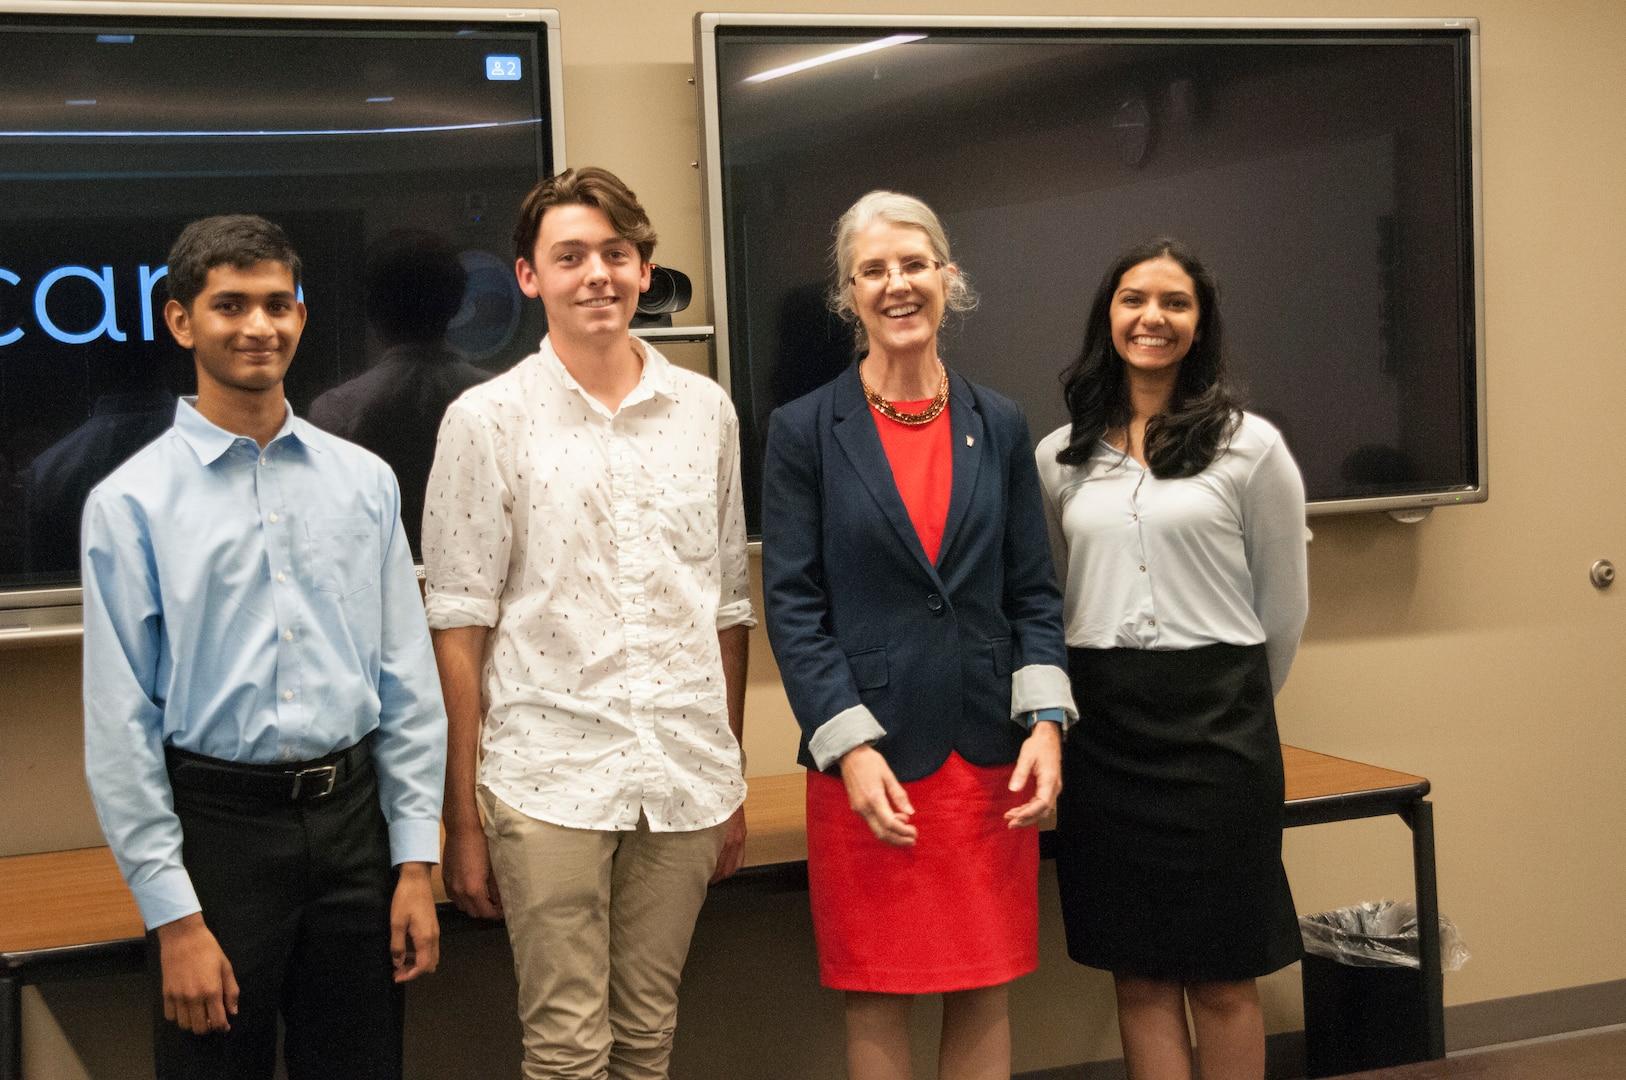 (l to r.) Karthik Yegnesh, runner-up; Charles Noyes, first place winner; Dr. Deborah Frincke, NSA Research Director; Rucha Joshi, runner-up